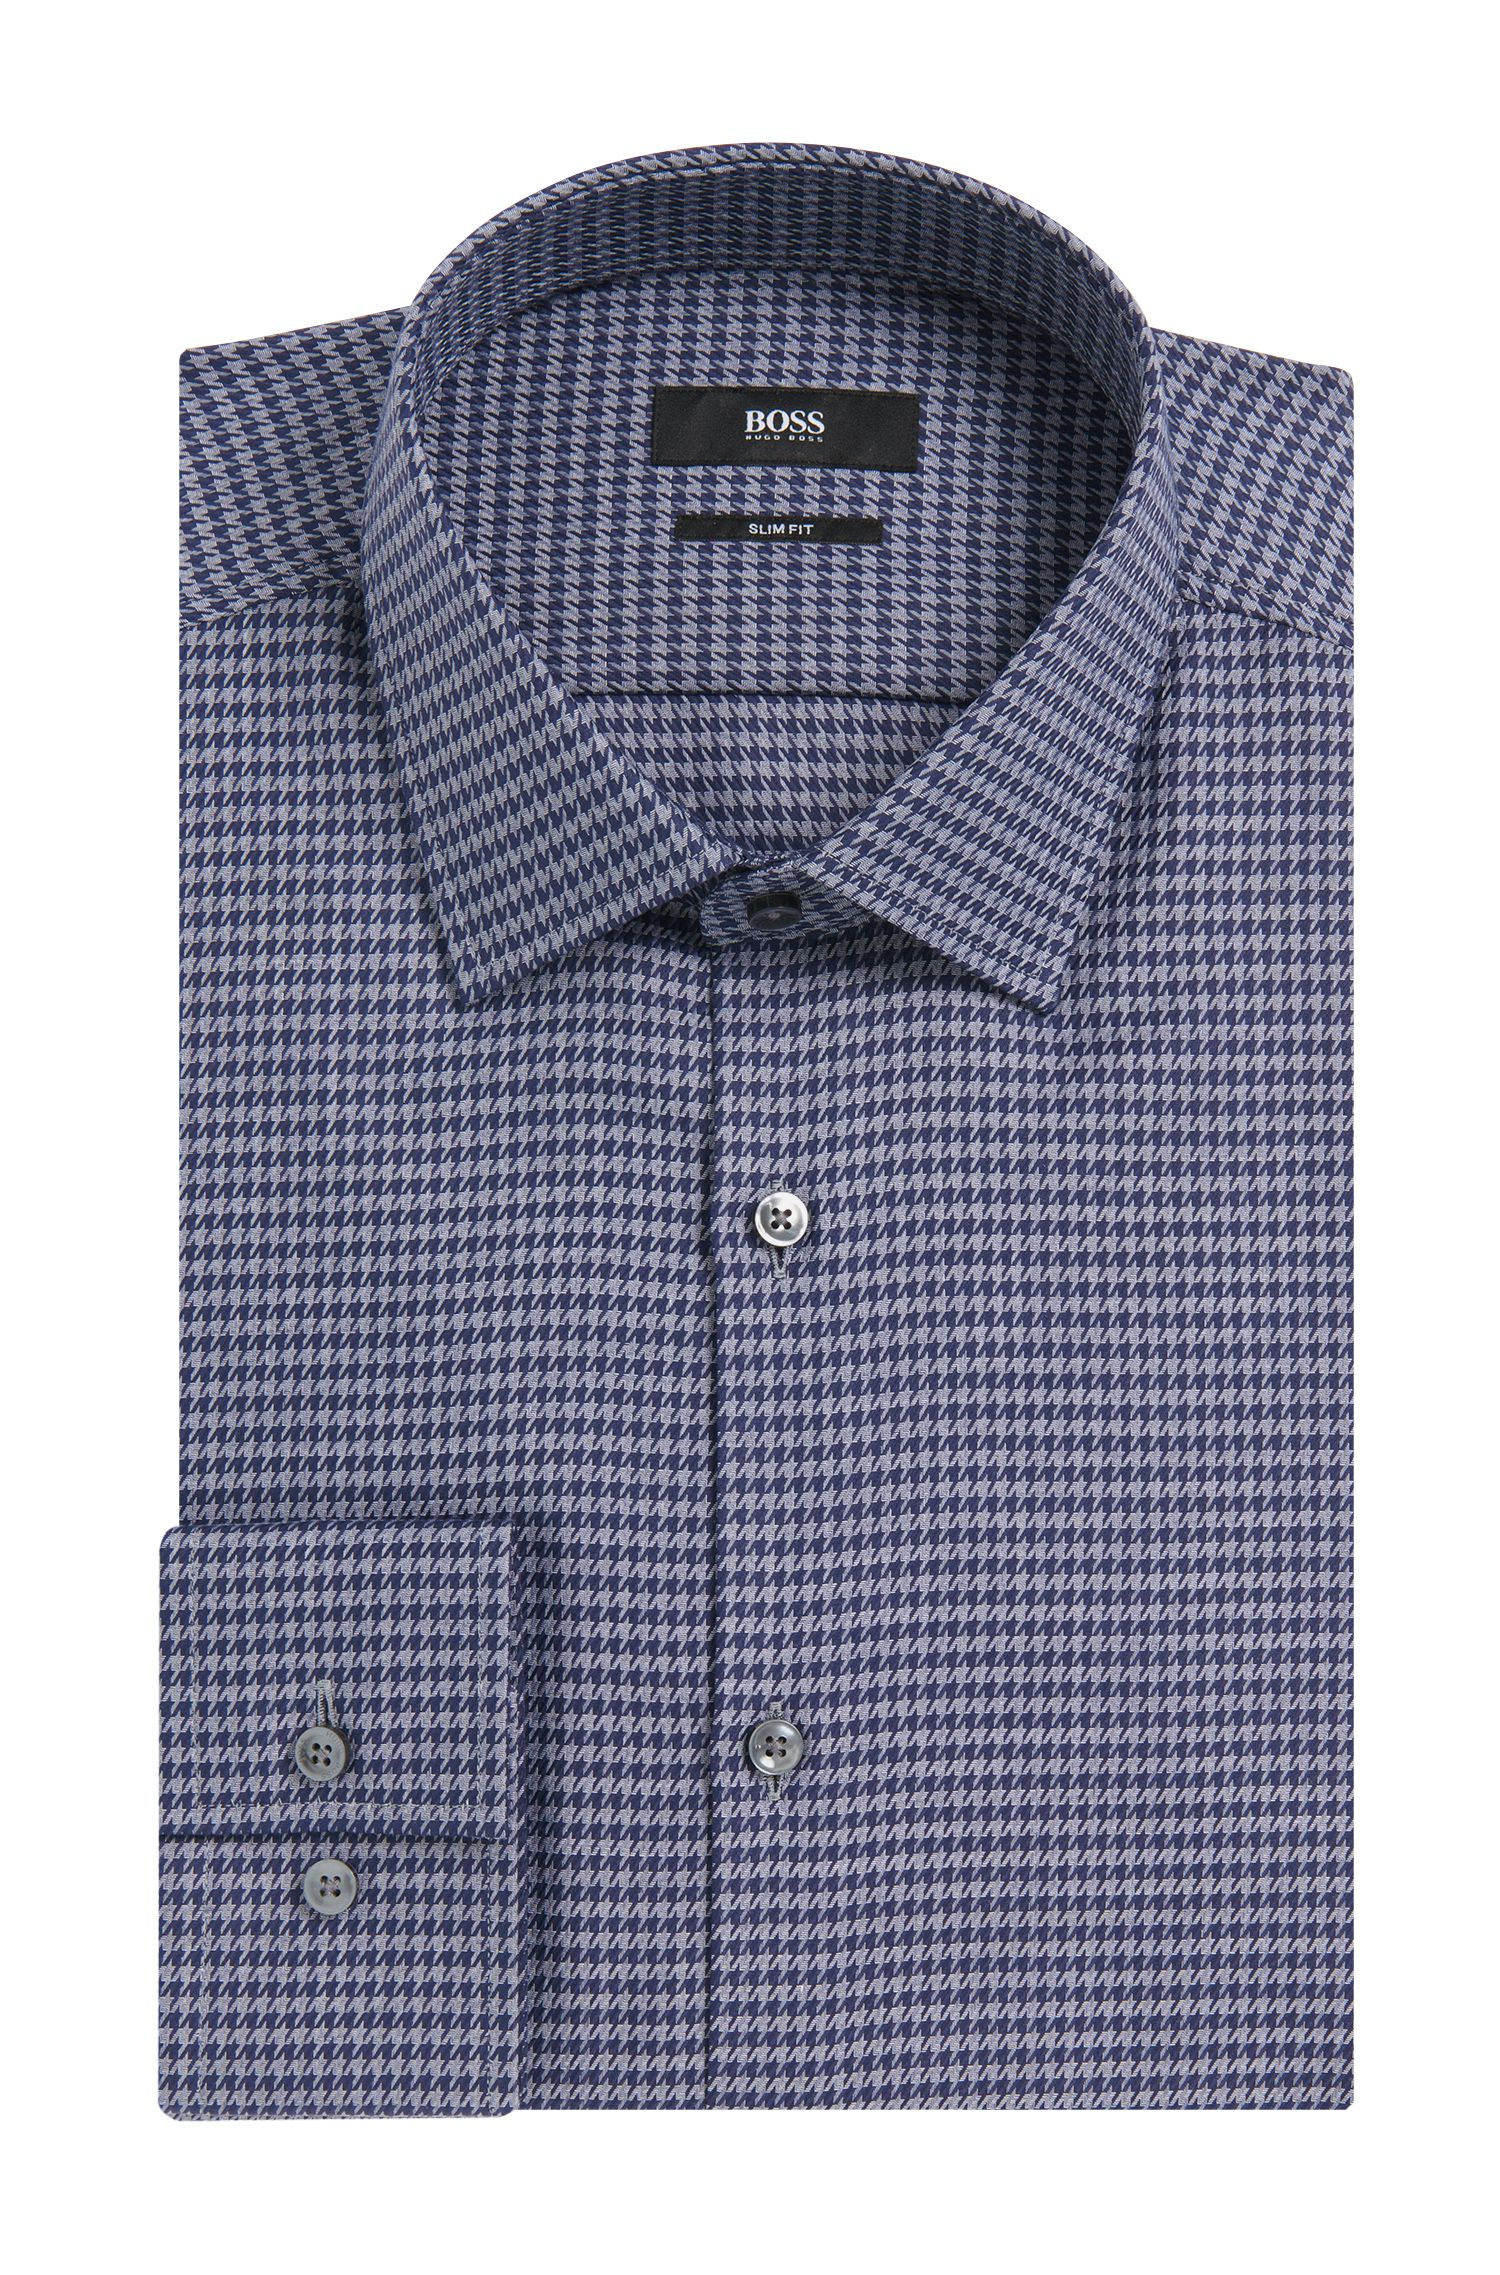 'Jenno' | Slim Fit, Cotton Dress Shirt